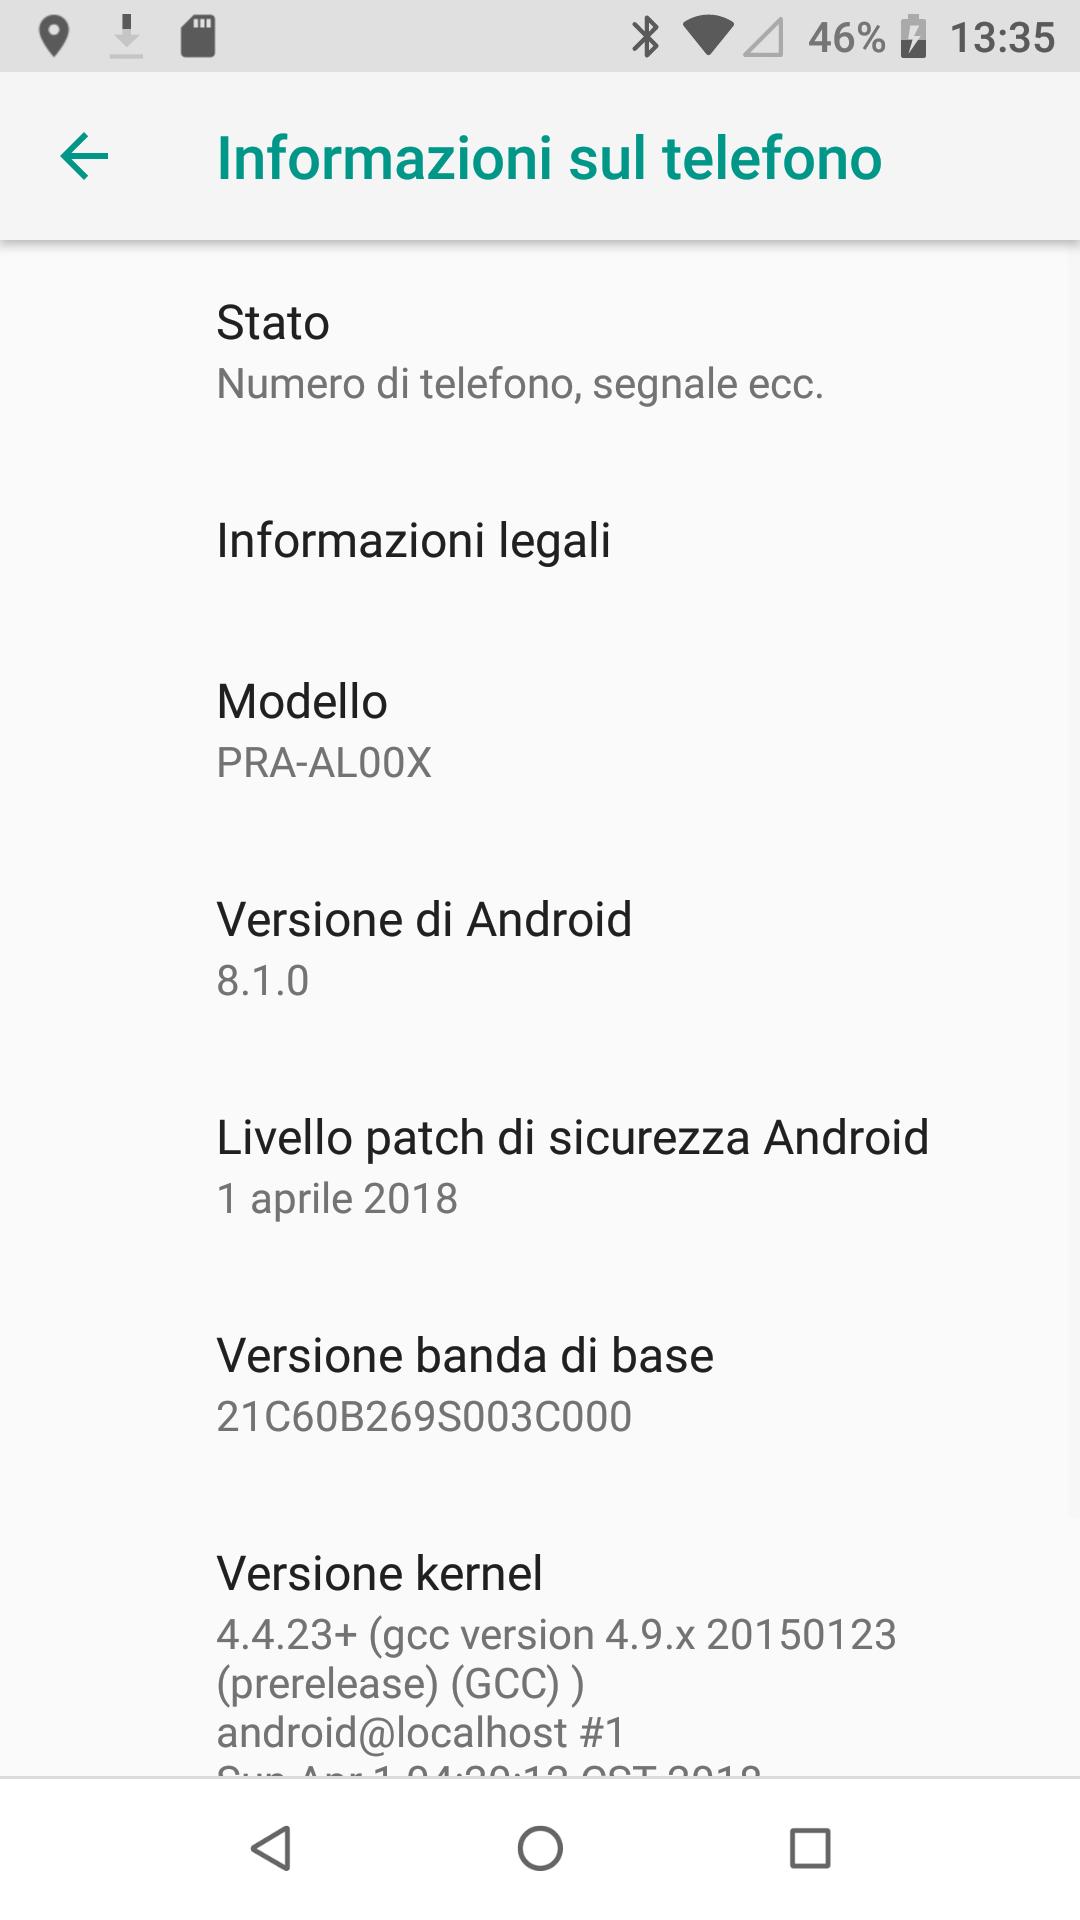 EMUI 8.0 Based Android 8.0 Oreo Beta for Huawei P8 Lite Mohamedovic 03